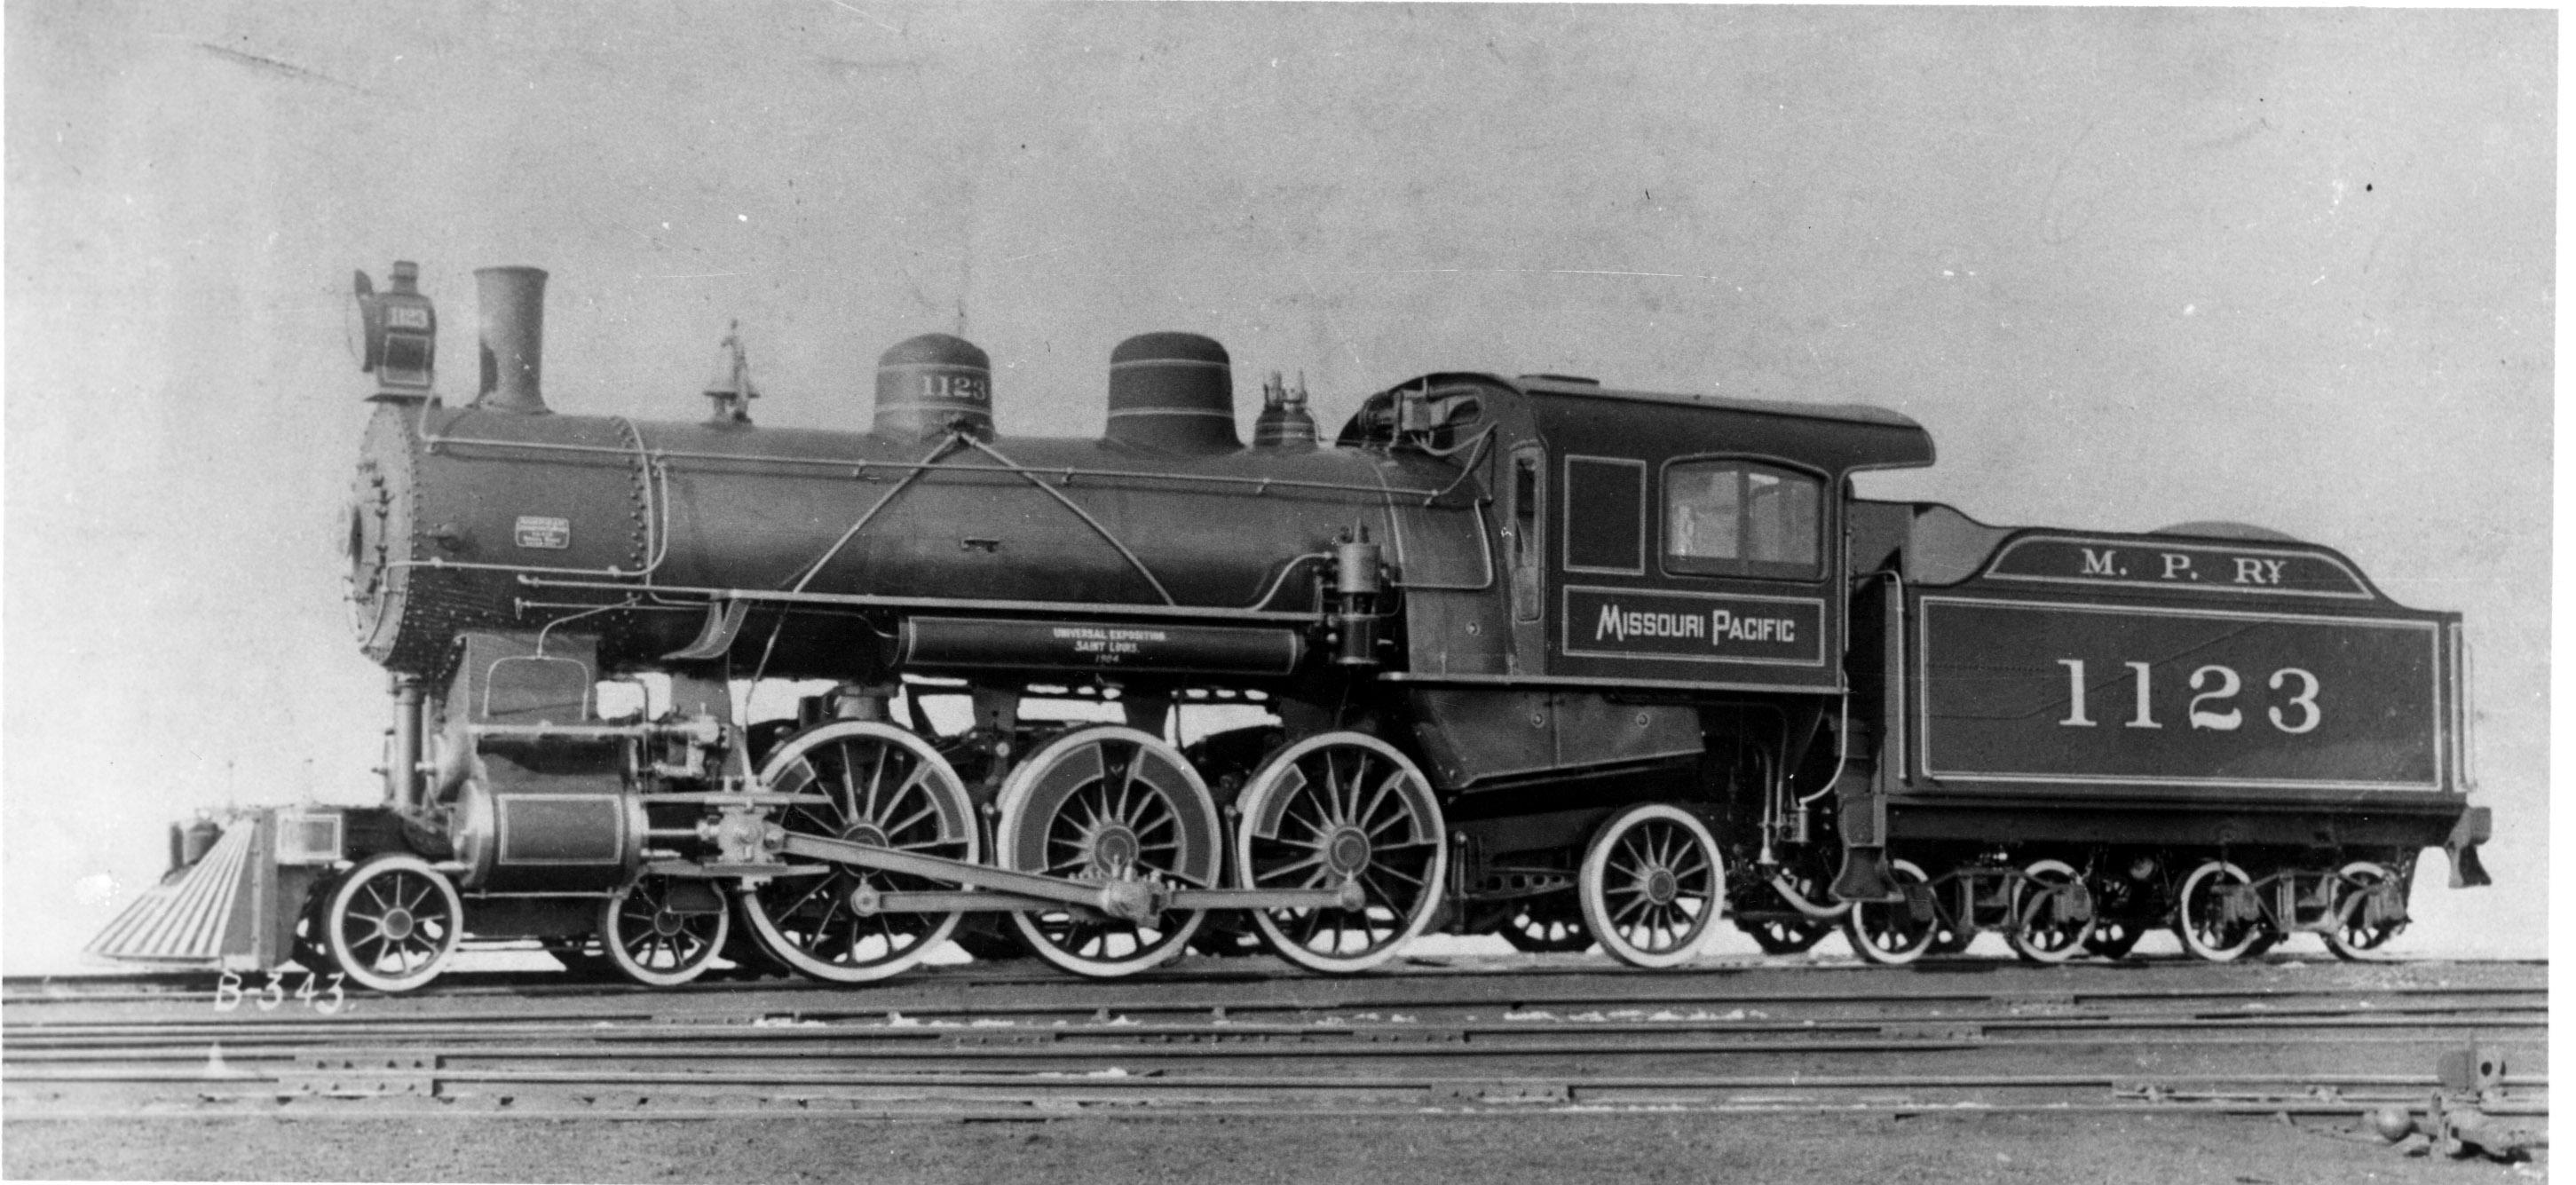 File:Missouri Pacific Train Number 1123 (MSA).jpg